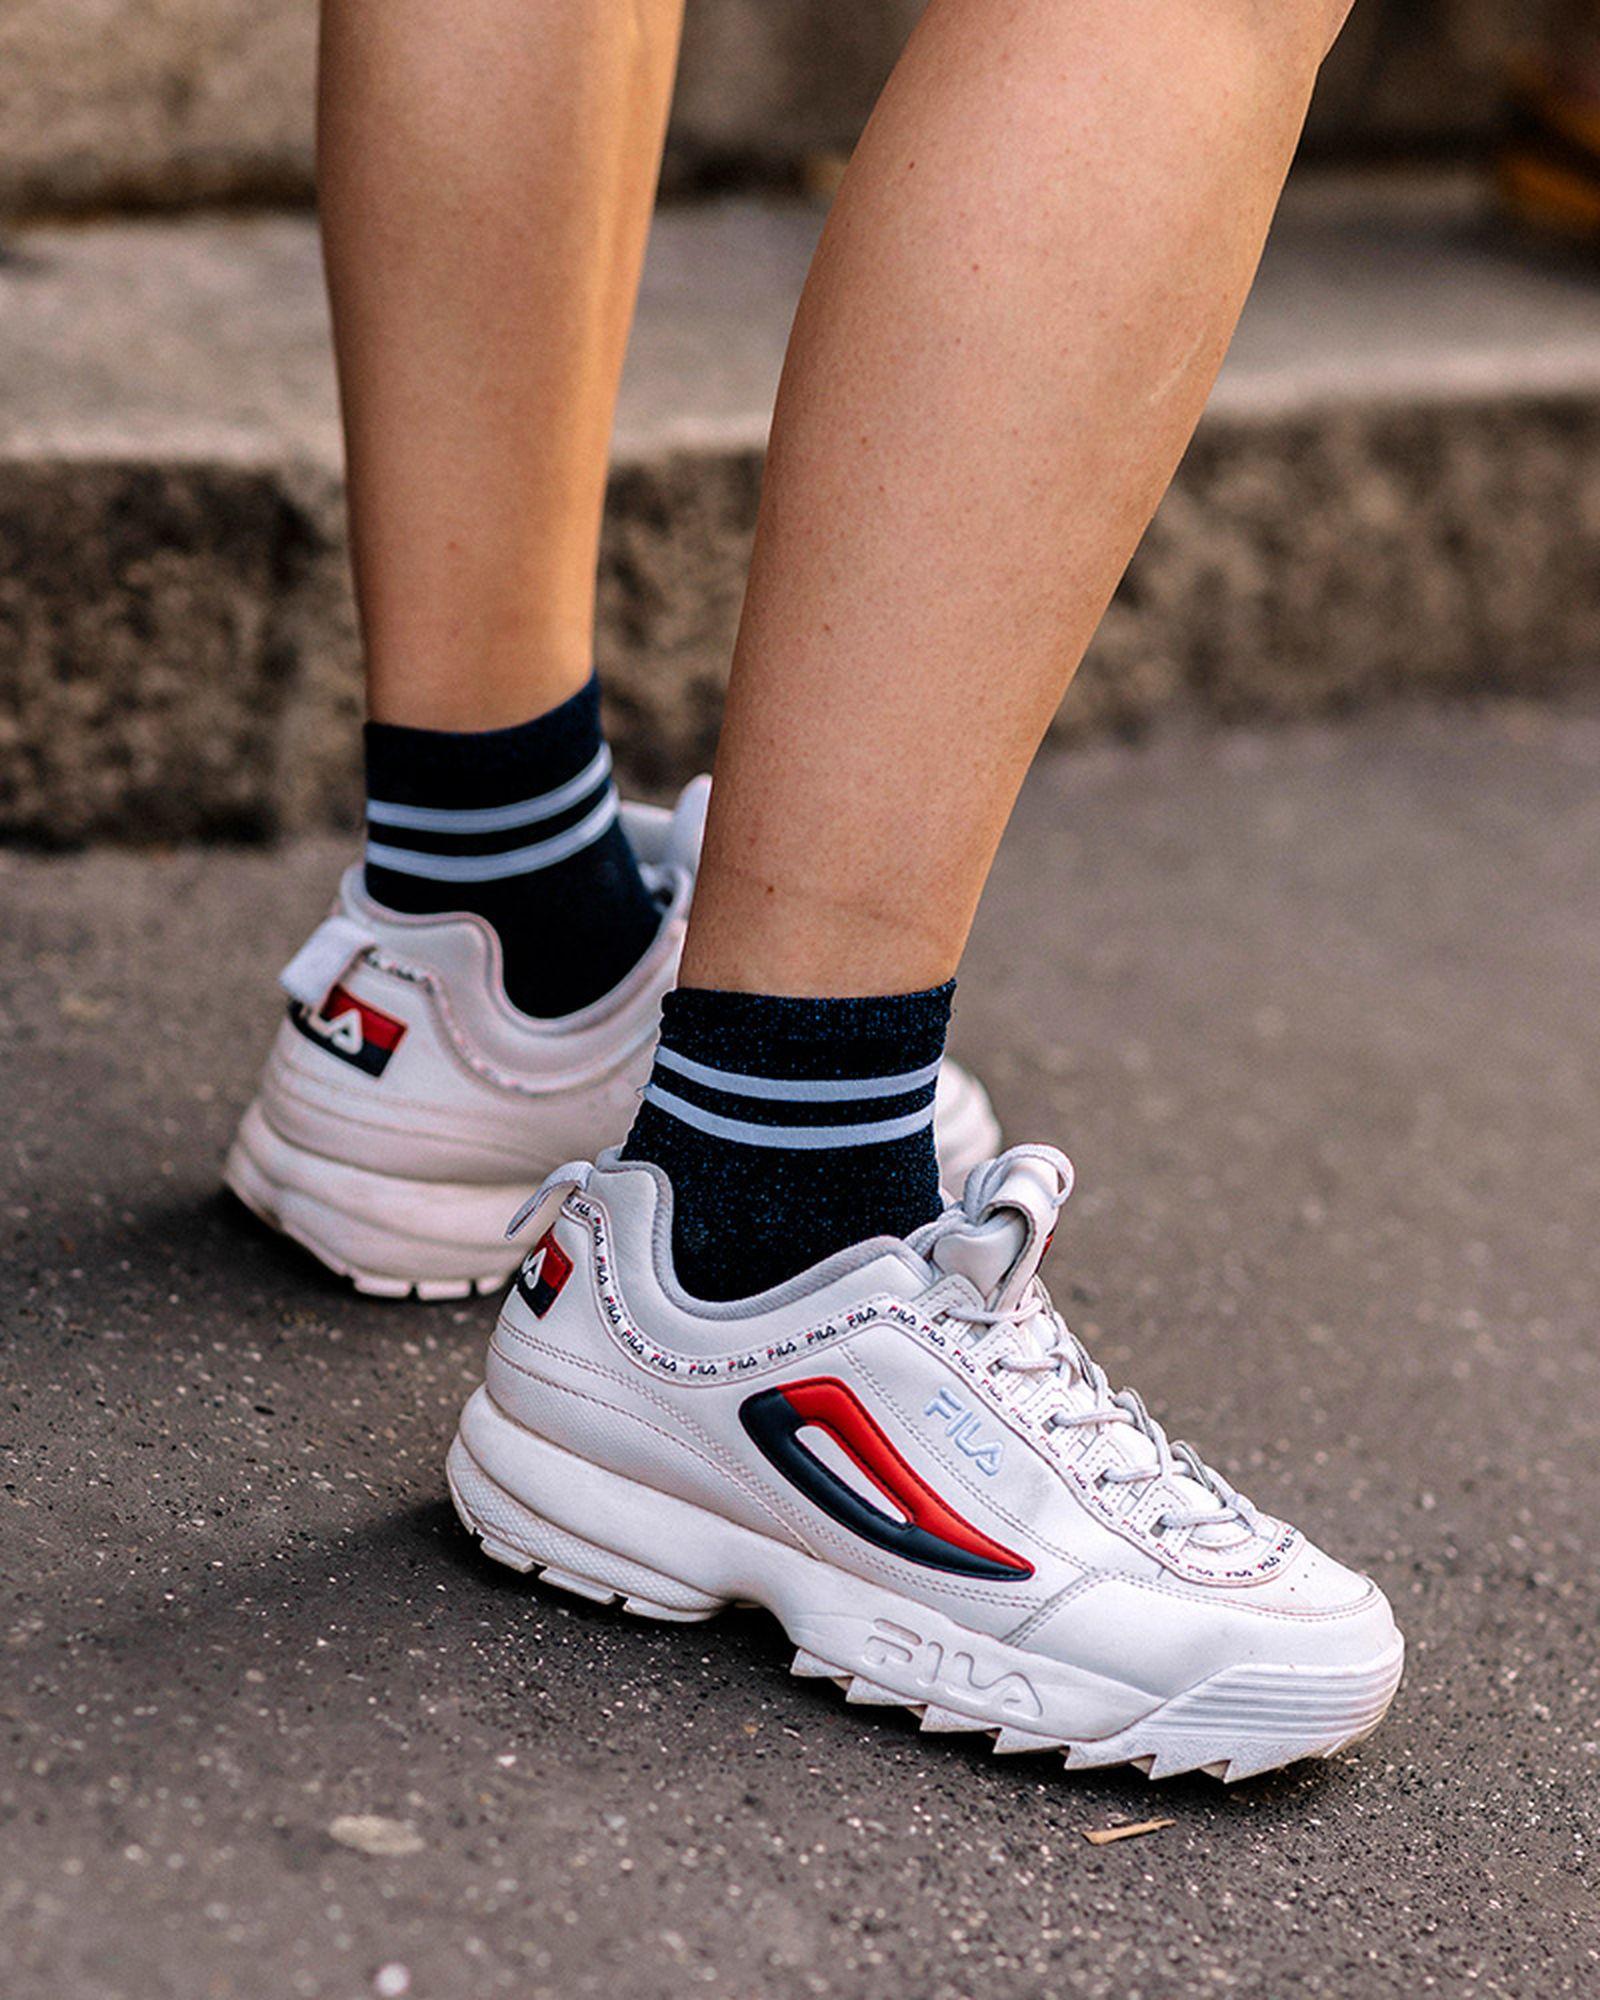 womens sneaker designs bringing boys yard Aleali May Balenciaga Louis Vuitton